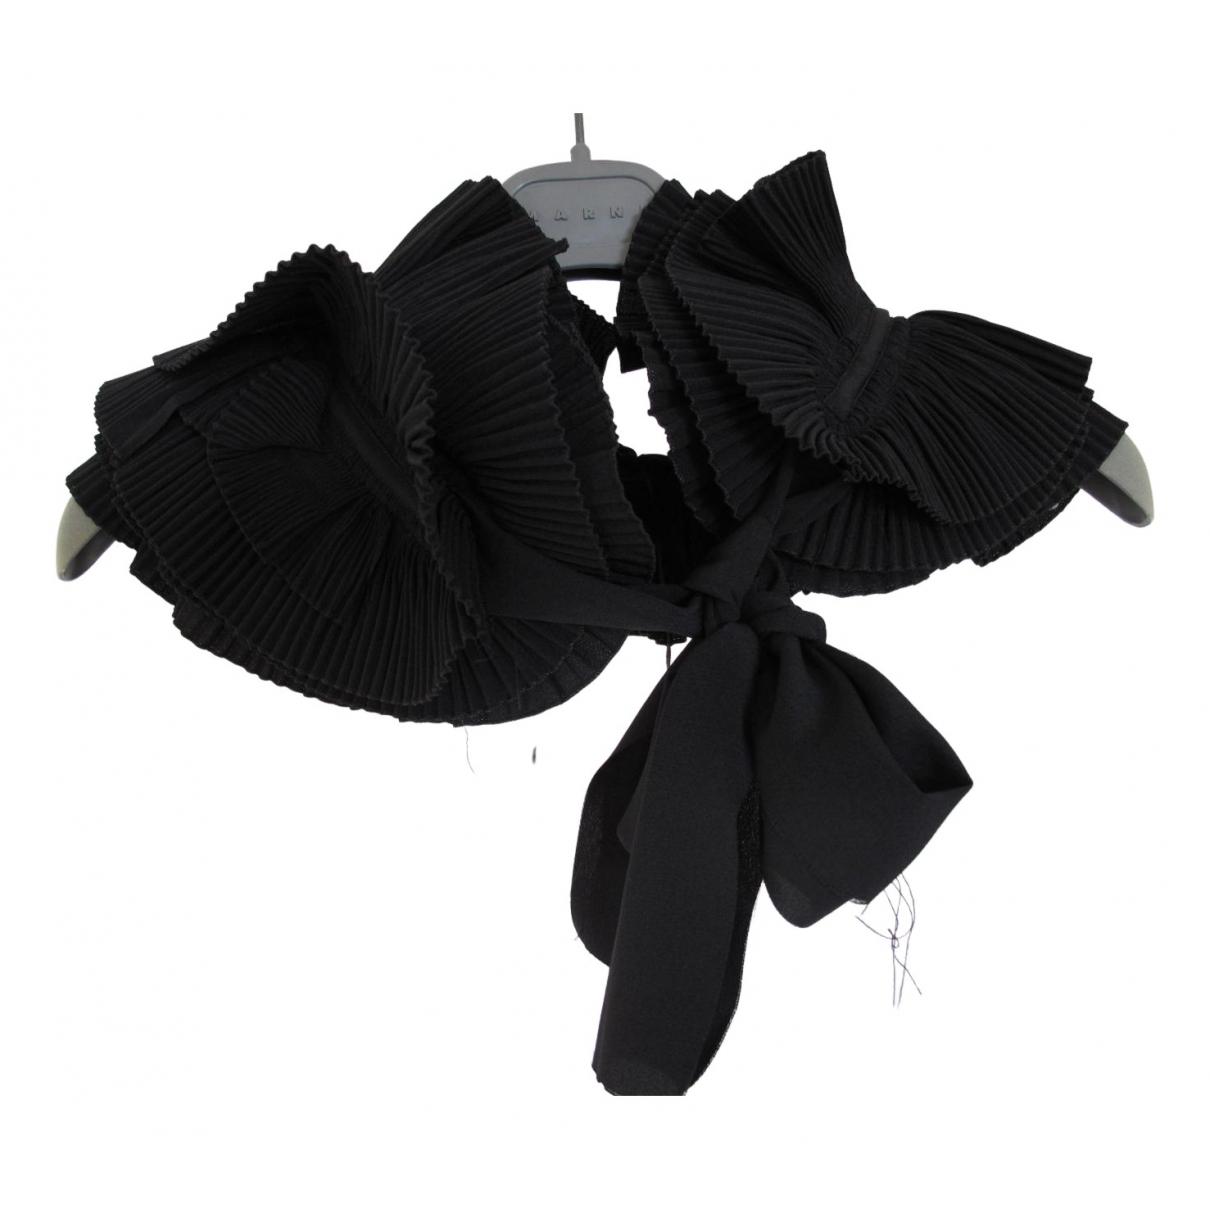 Marni N Black scarf for Women N